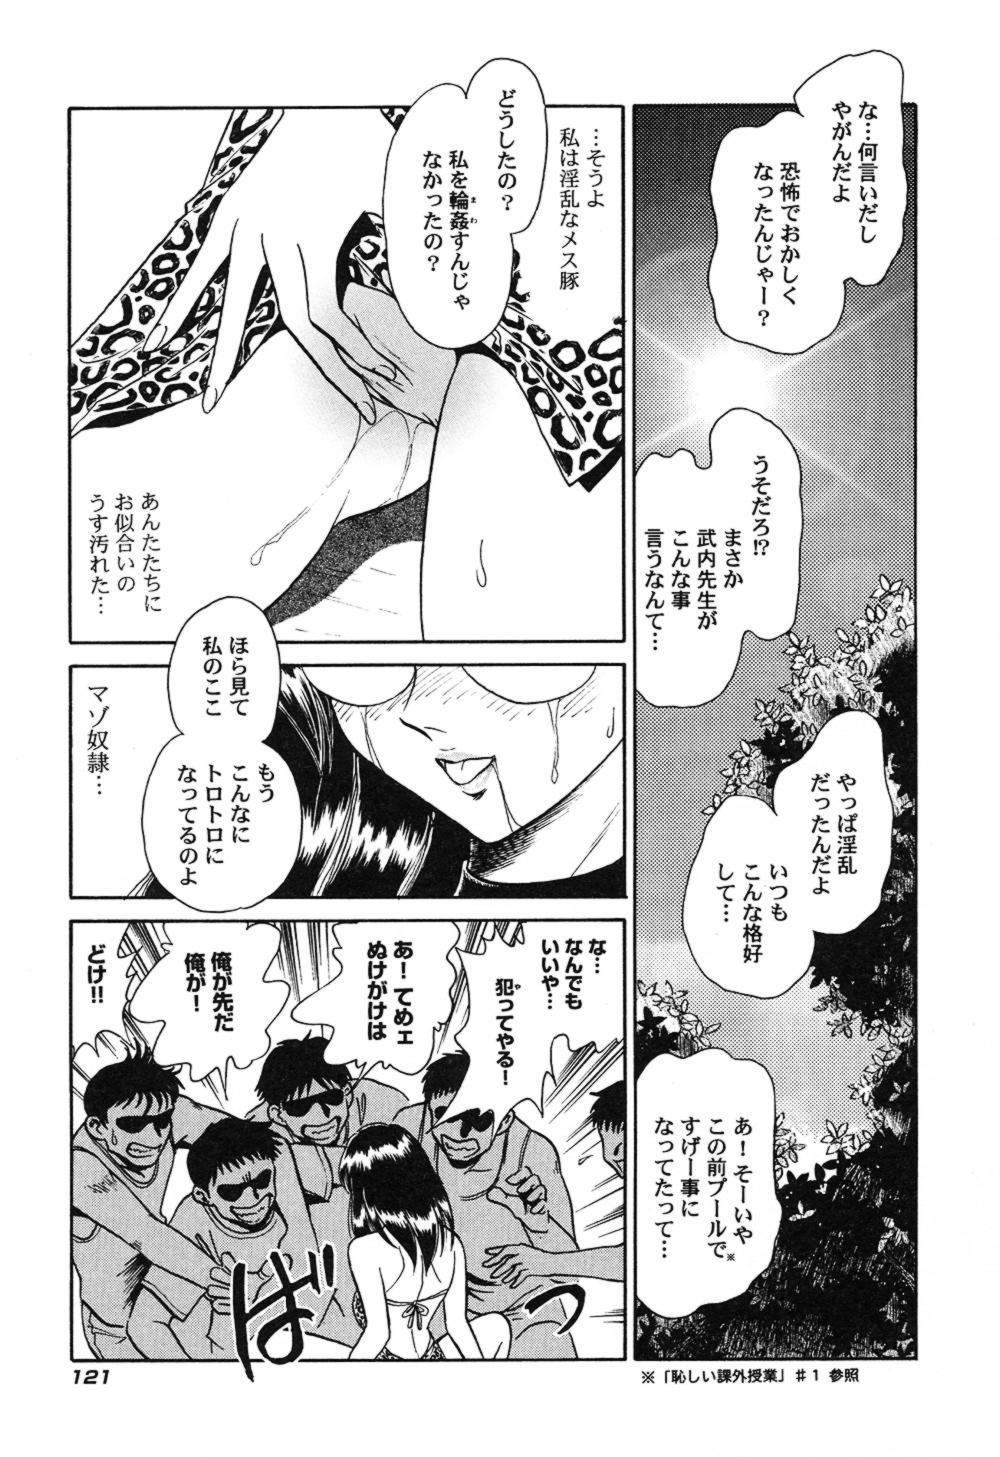 Hageshii Kagai Jugyou 123